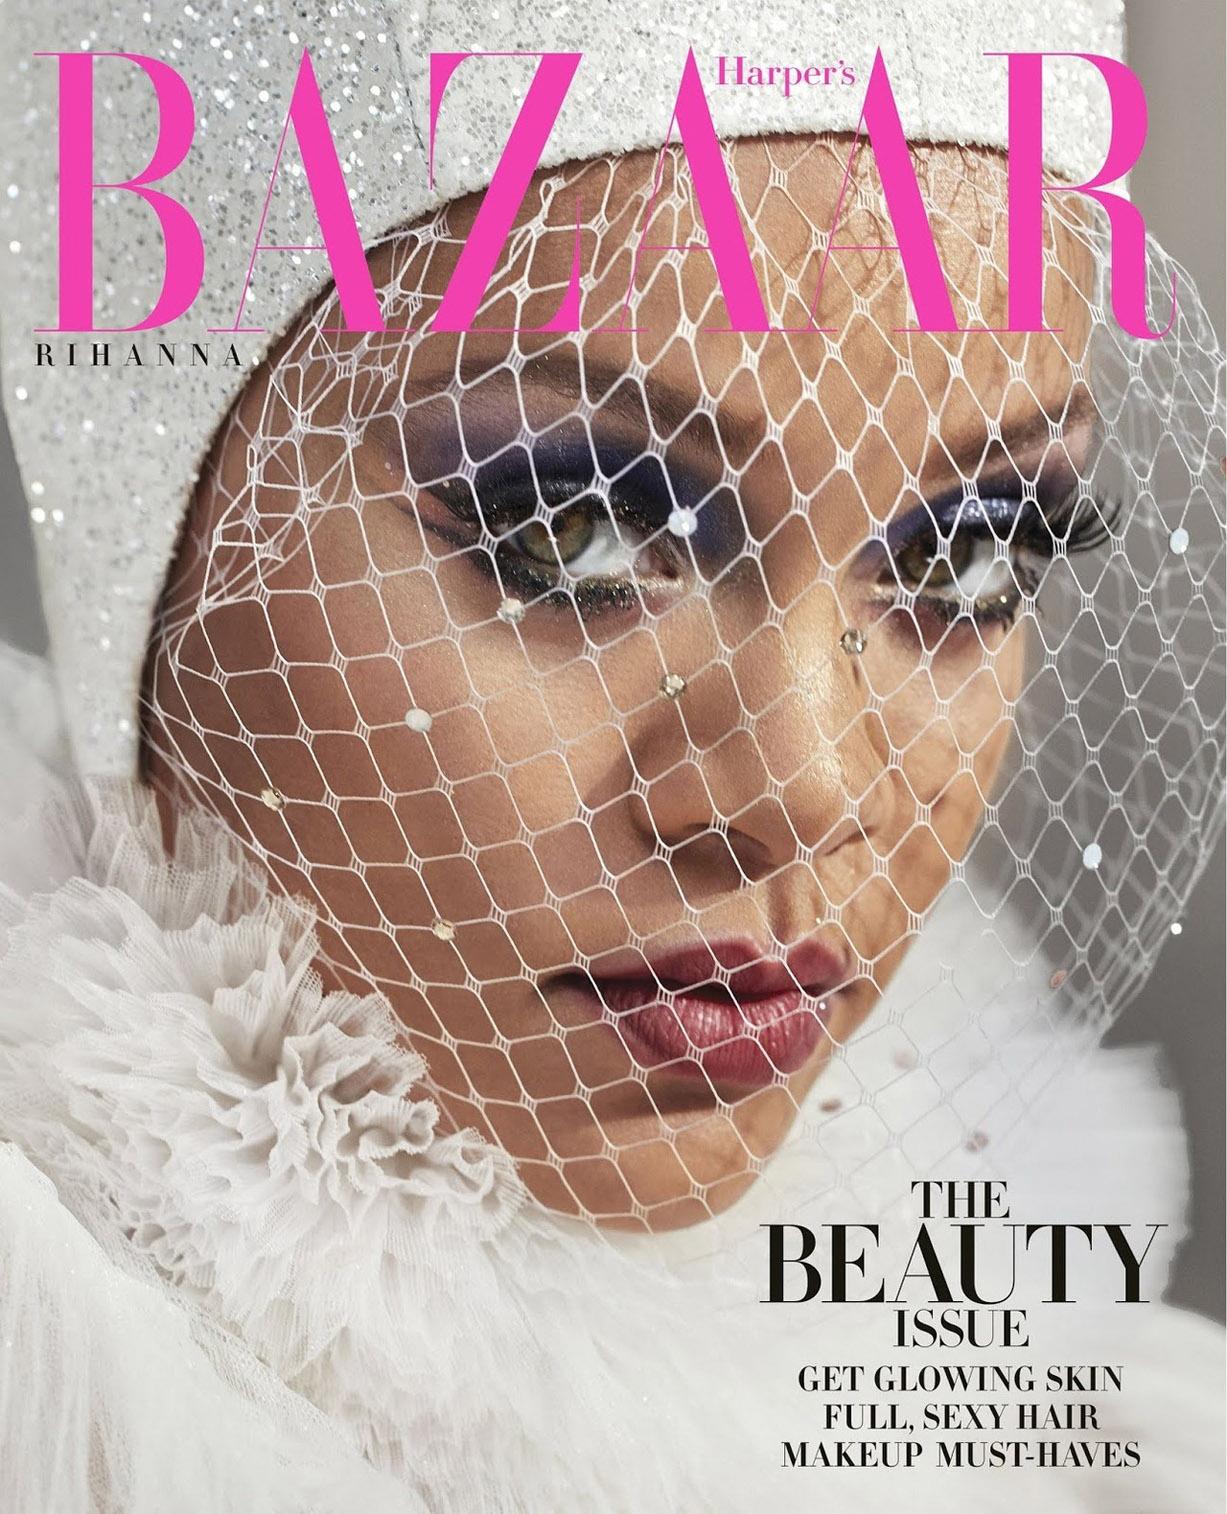 Rihanna by Dennis Leupold / Harpers Bazaar US may 2019